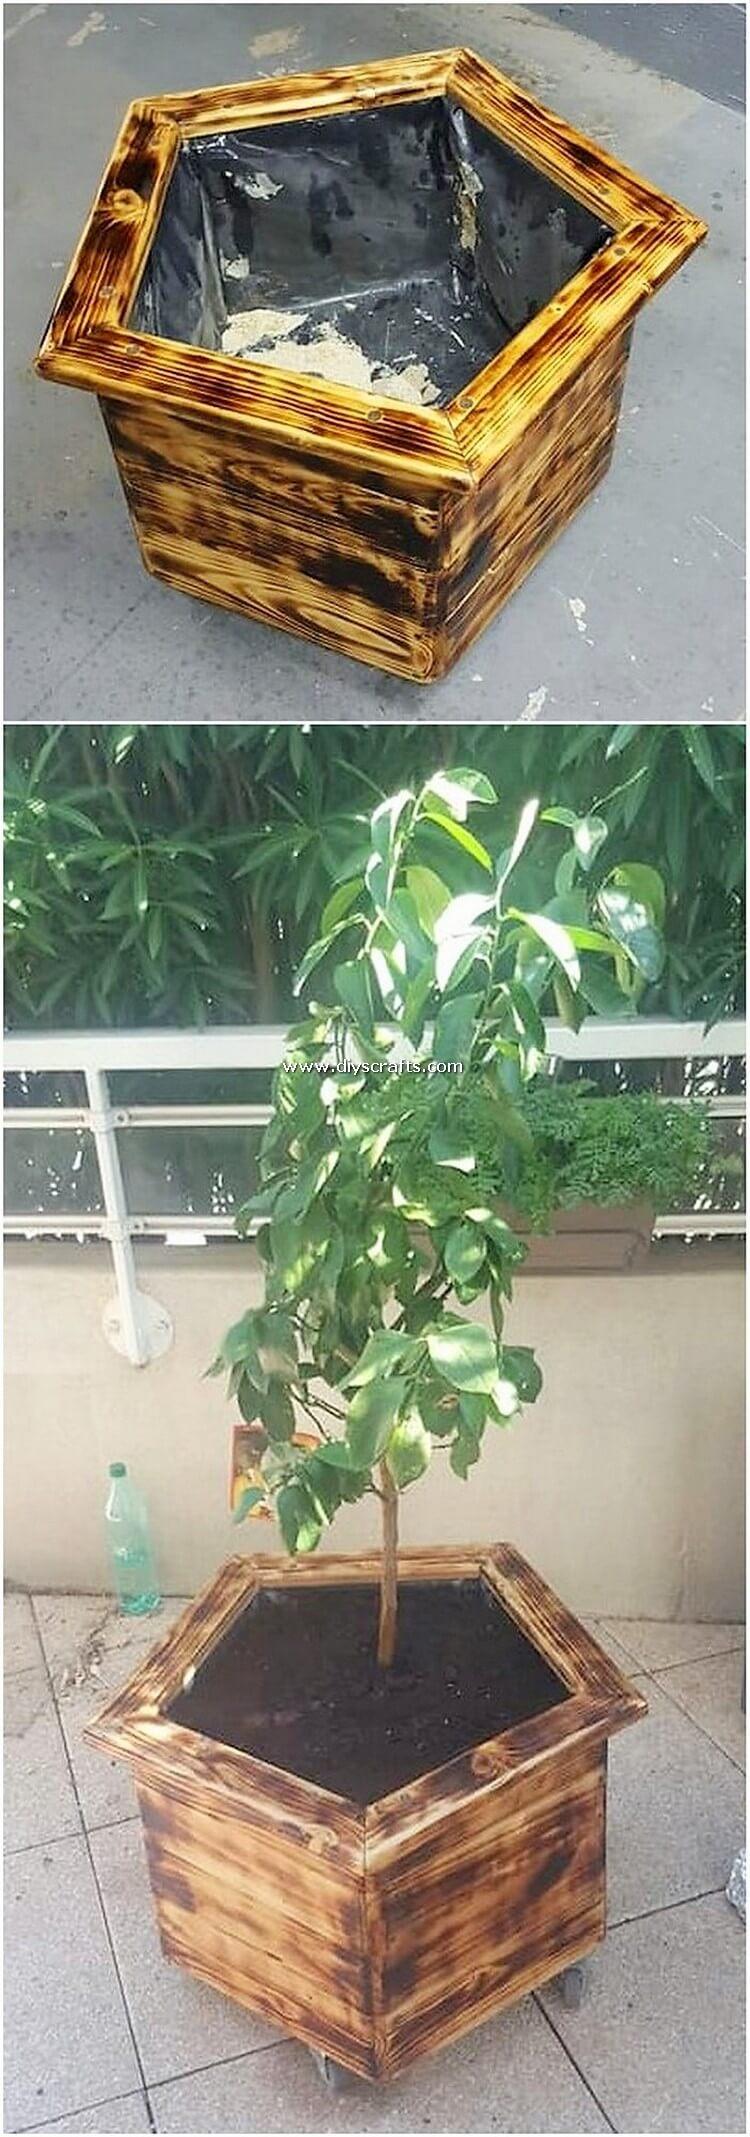 Pallet-Planter-Box